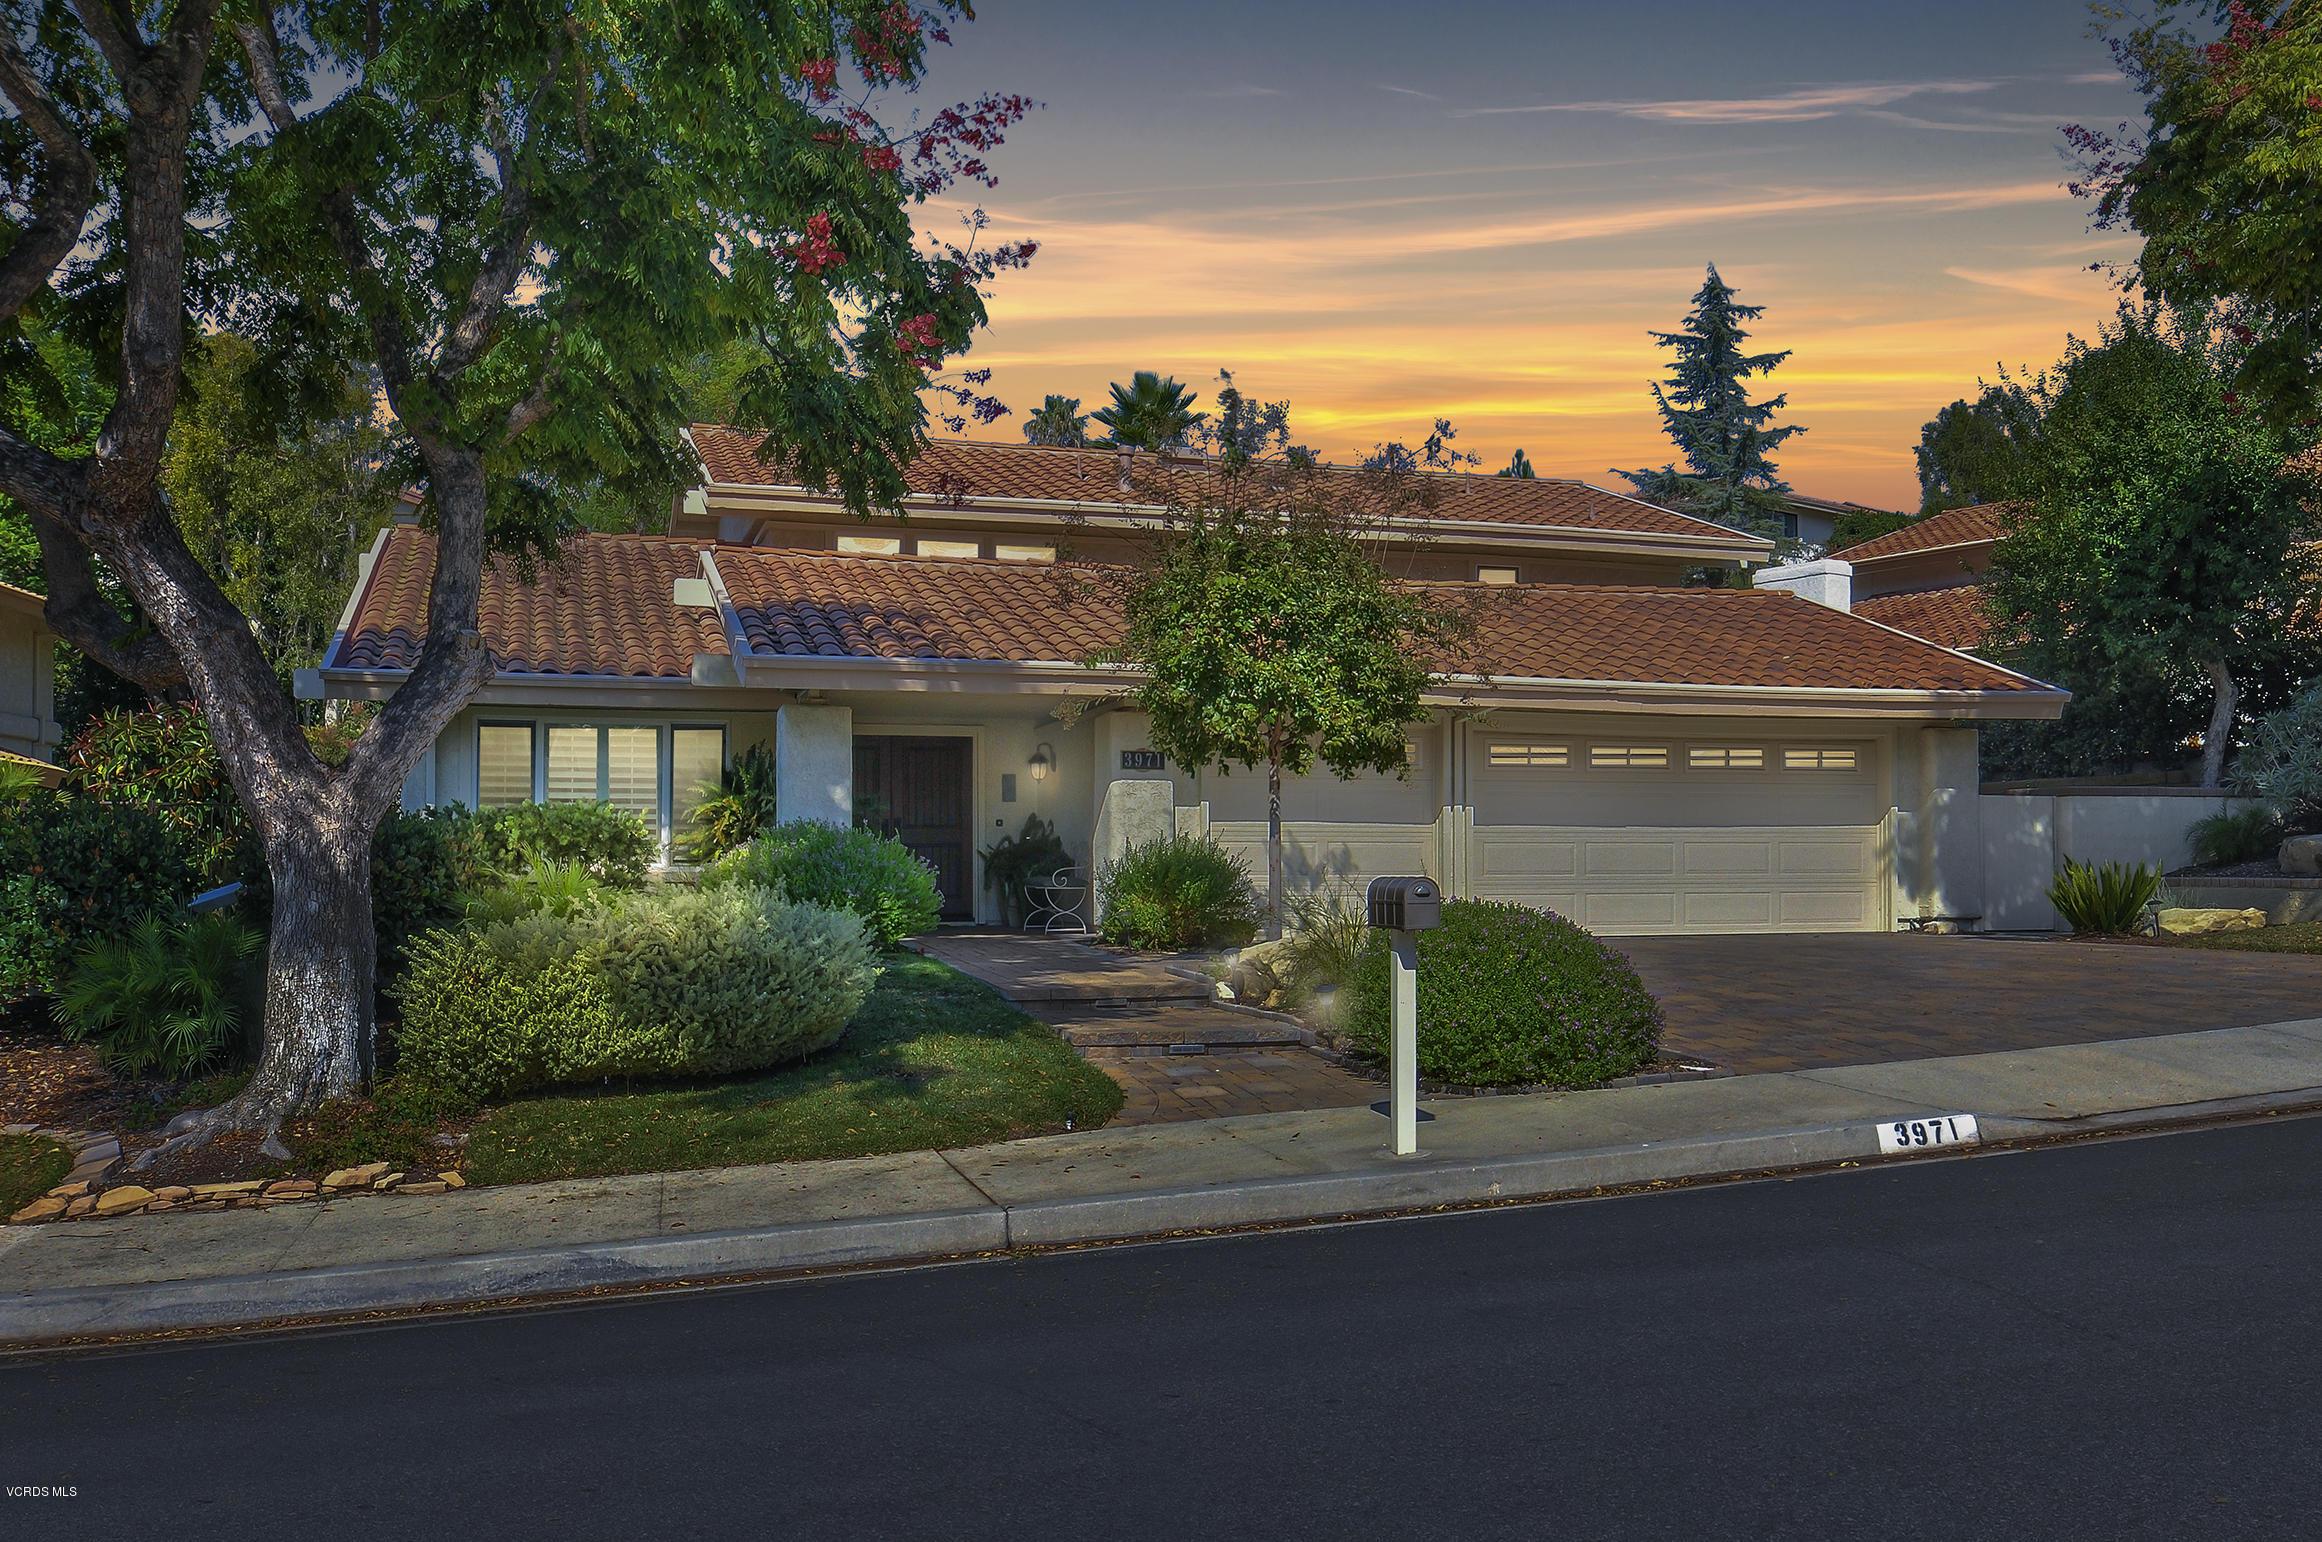 3971 Calle Del Sol, Thousand Oaks, CA 91360